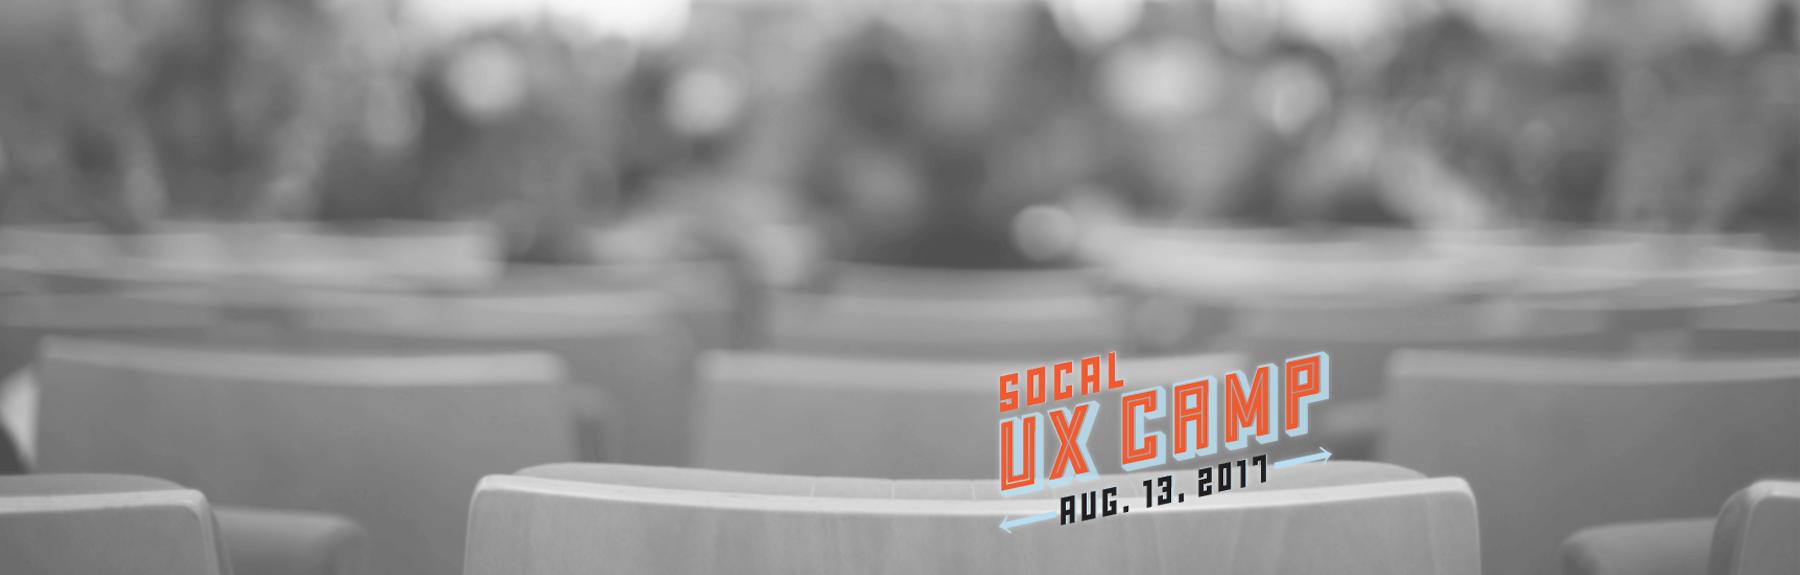 socal-ux-camp-justinmind-prototyping-tool-sponsors-header